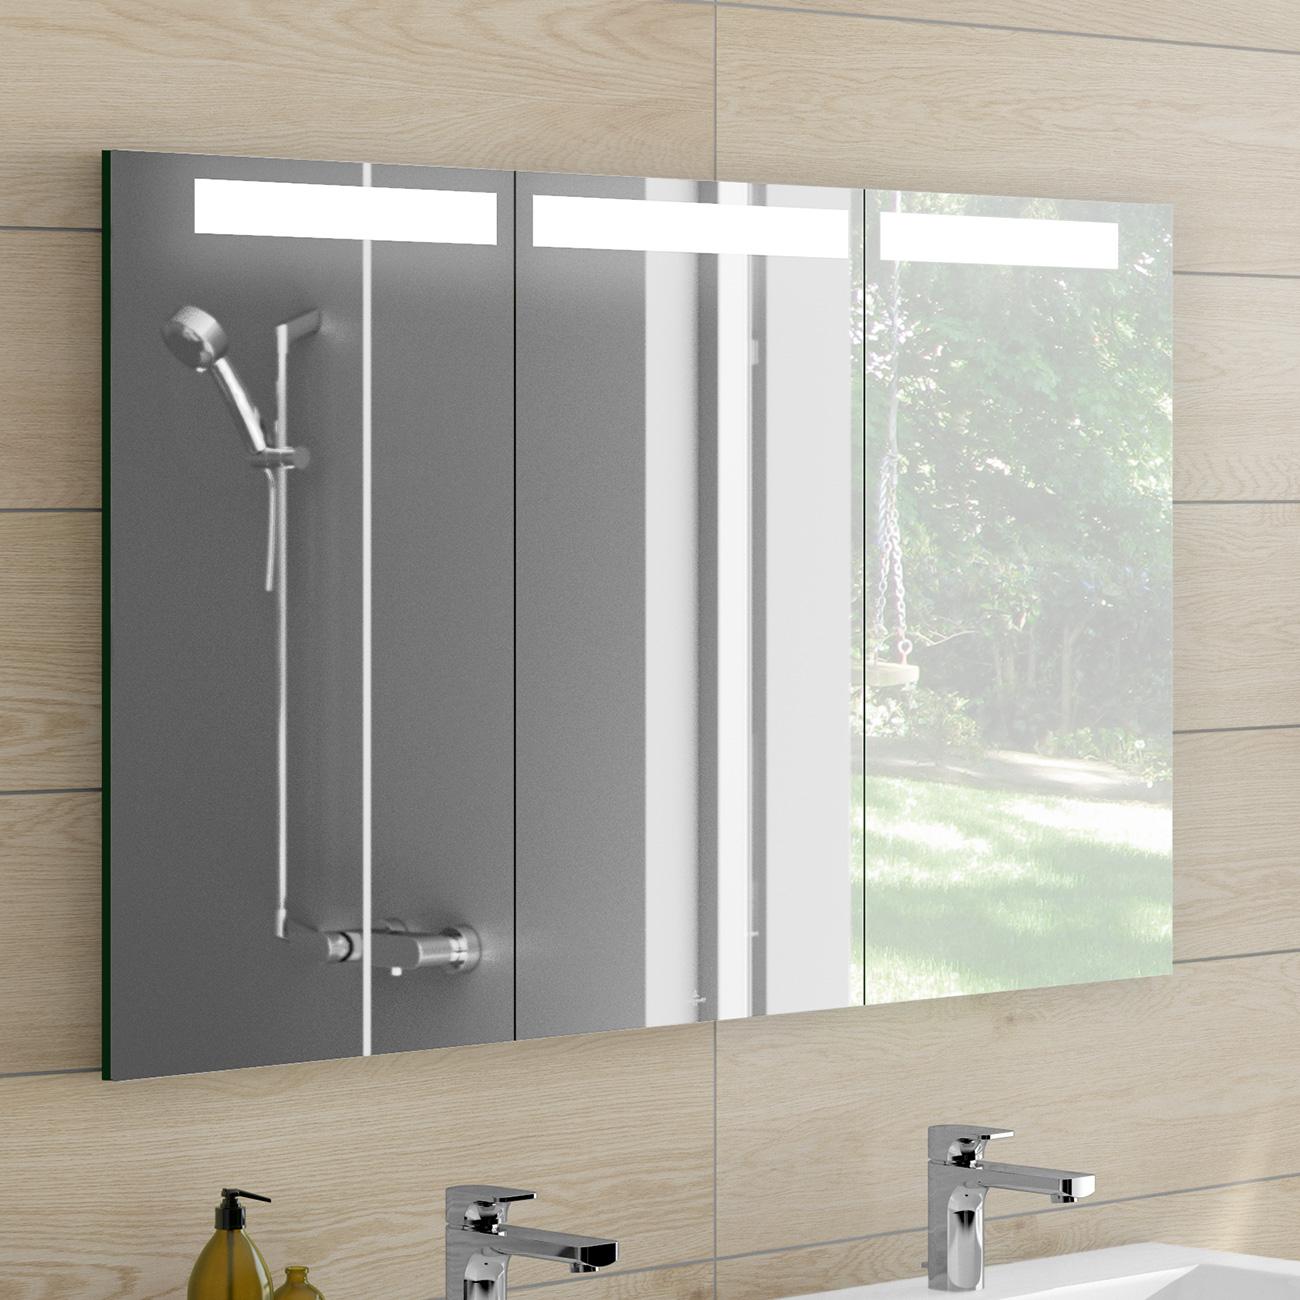 villeroy boch my view in spiegelschrank mit led. Black Bedroom Furniture Sets. Home Design Ideas